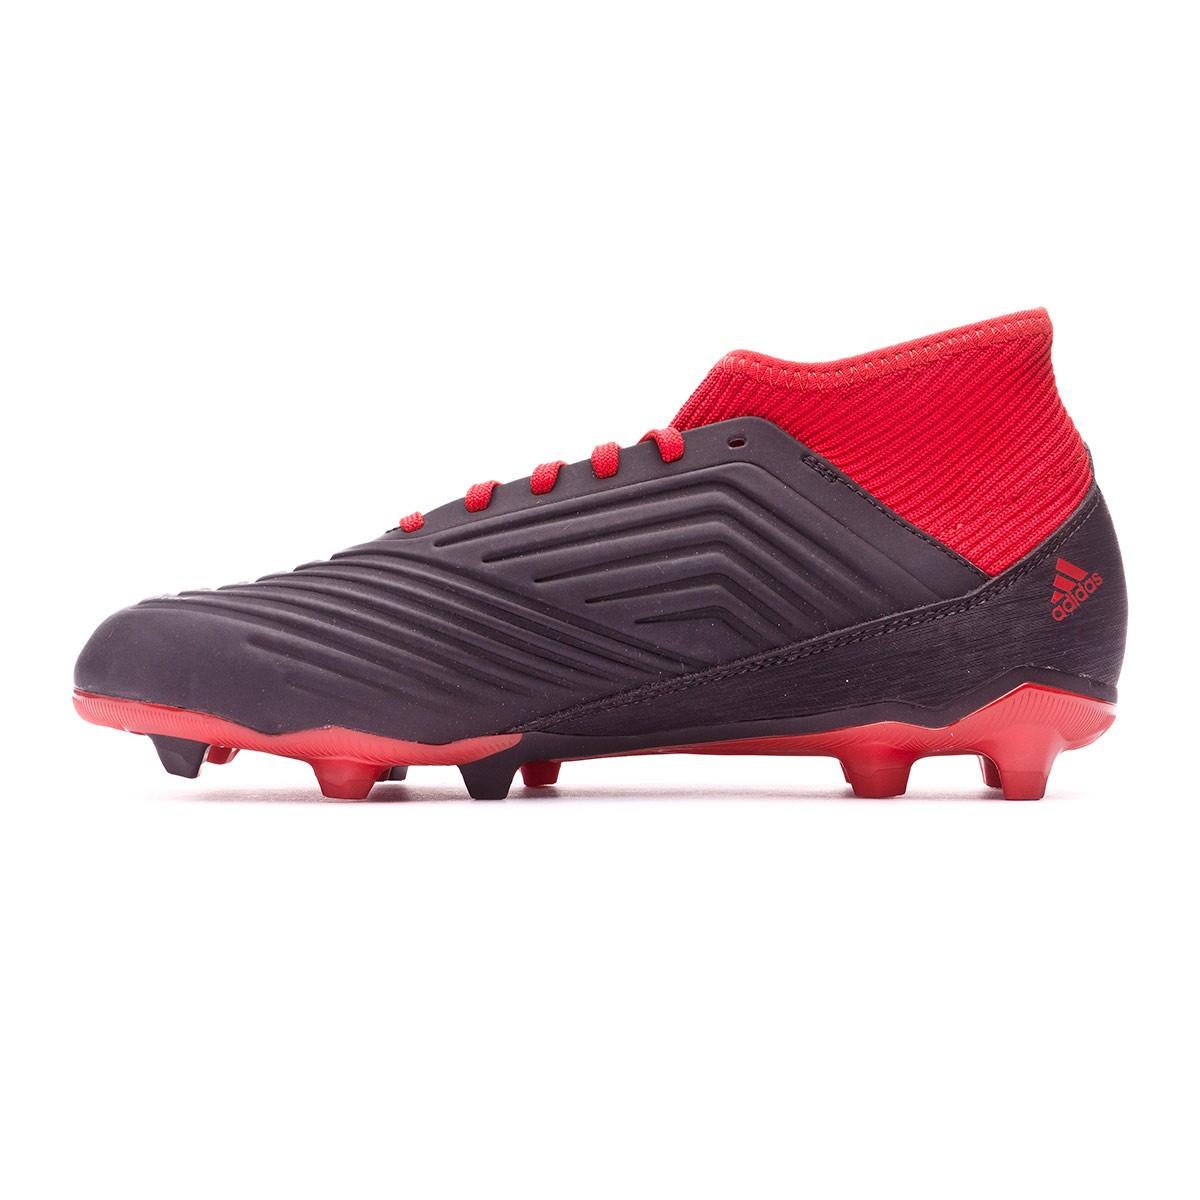 e8e6339f4841 Football Boots adidas Kids Predator 18.3 FG Core black-White-Red - Tienda  de fútbol Fútbol Emotion